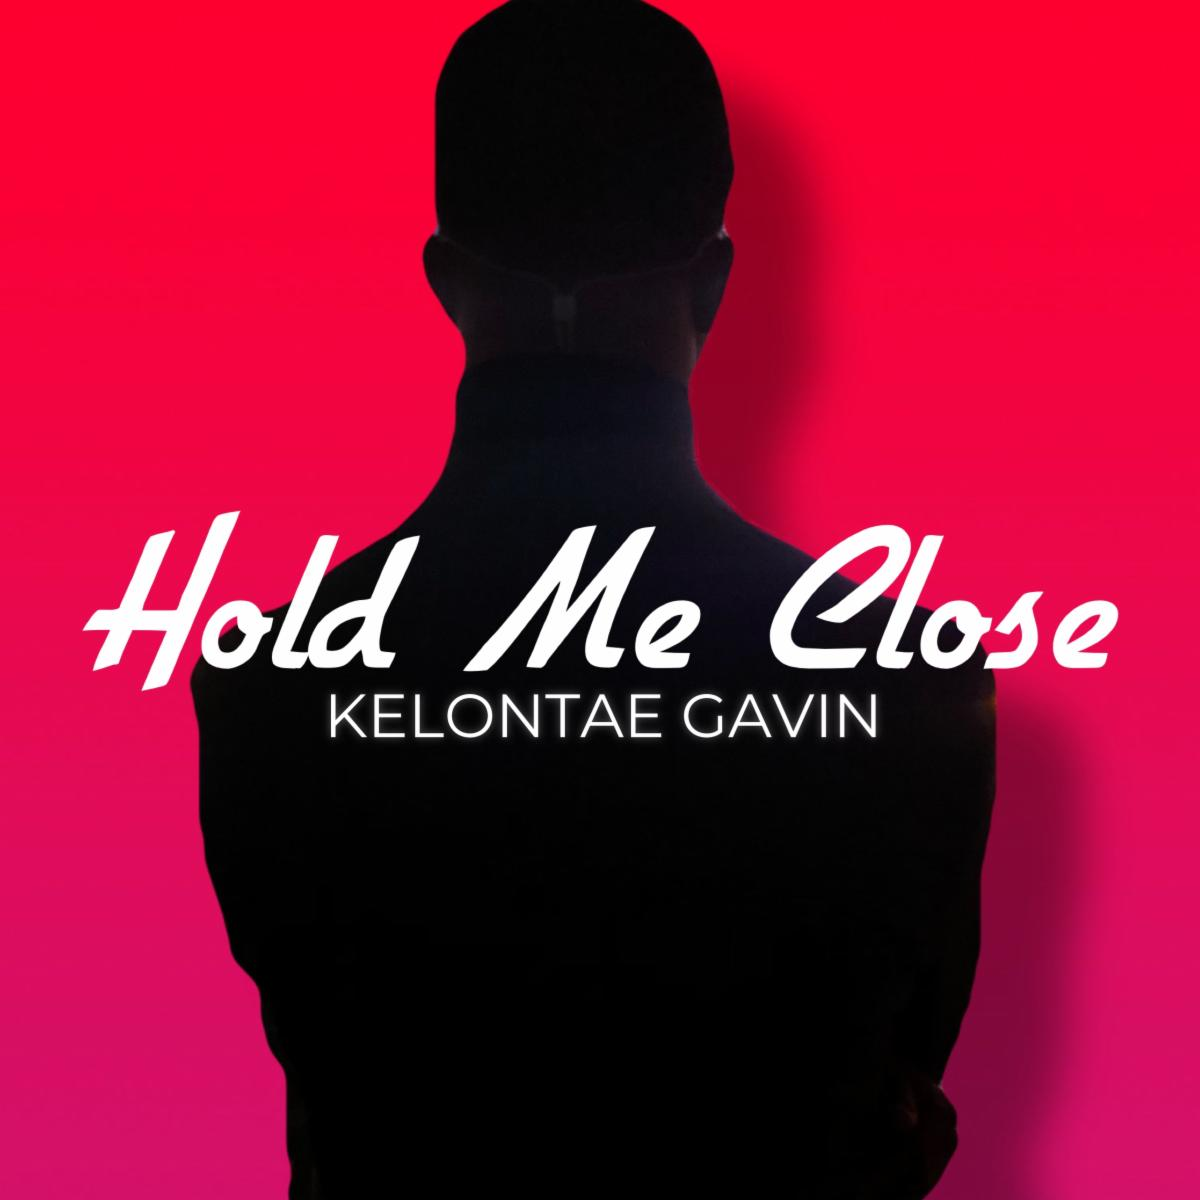 Kelontae Gavin - Hold Me Close